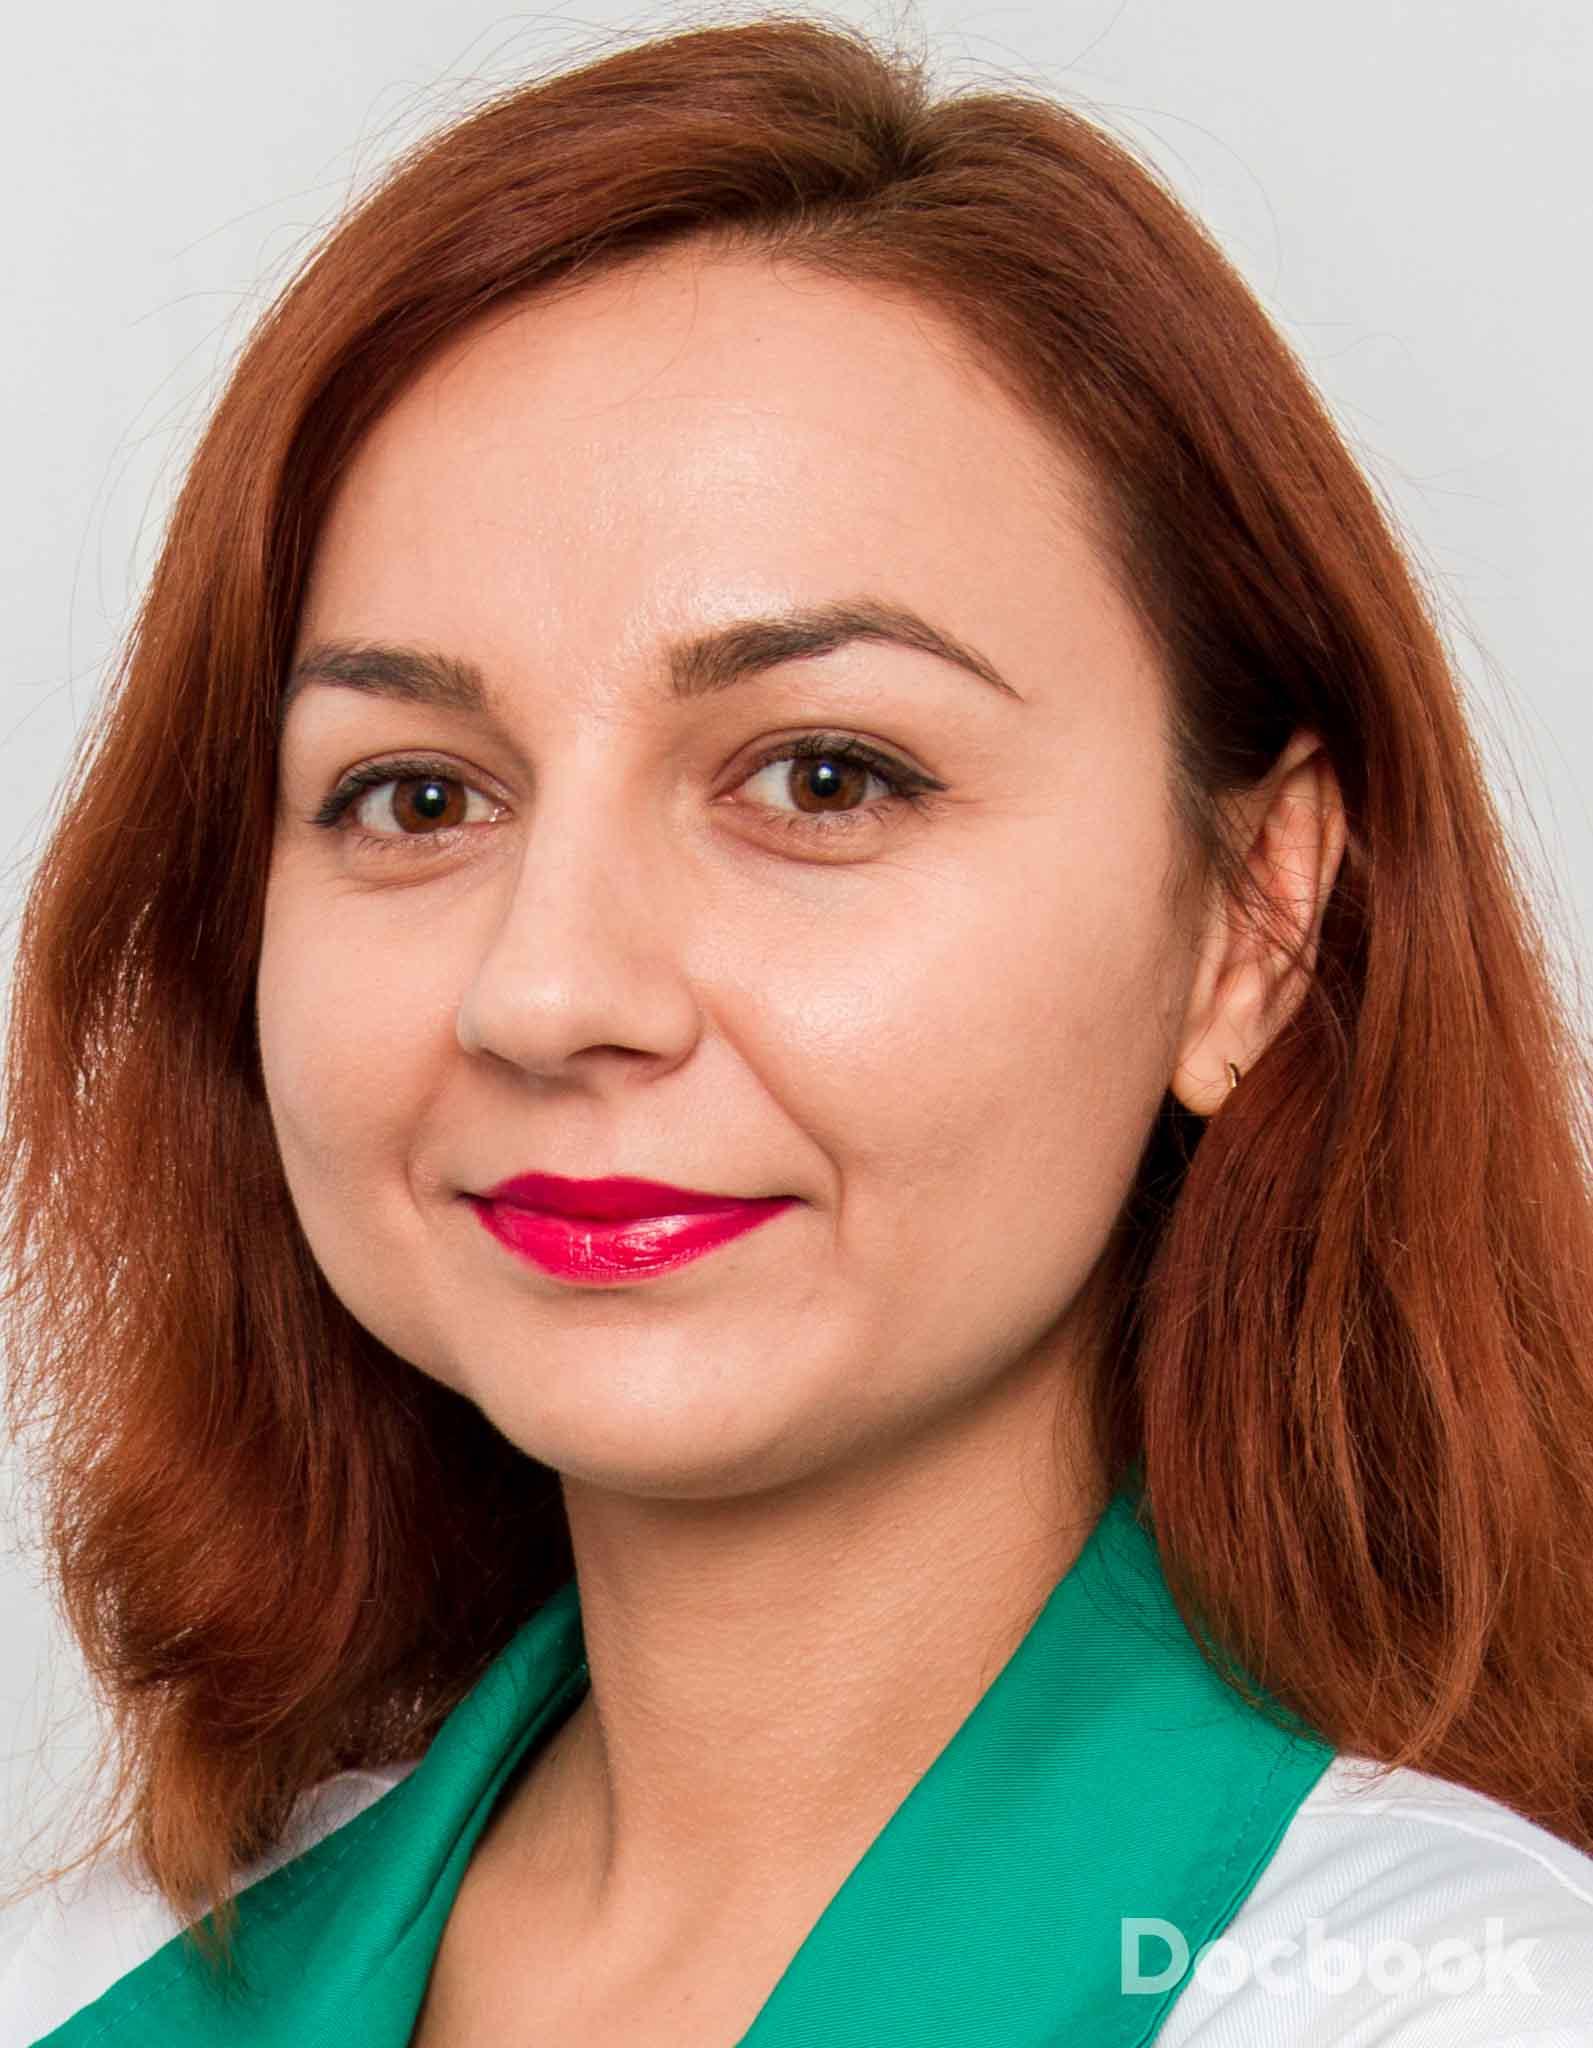 Dr. Gina Hristina Spataru